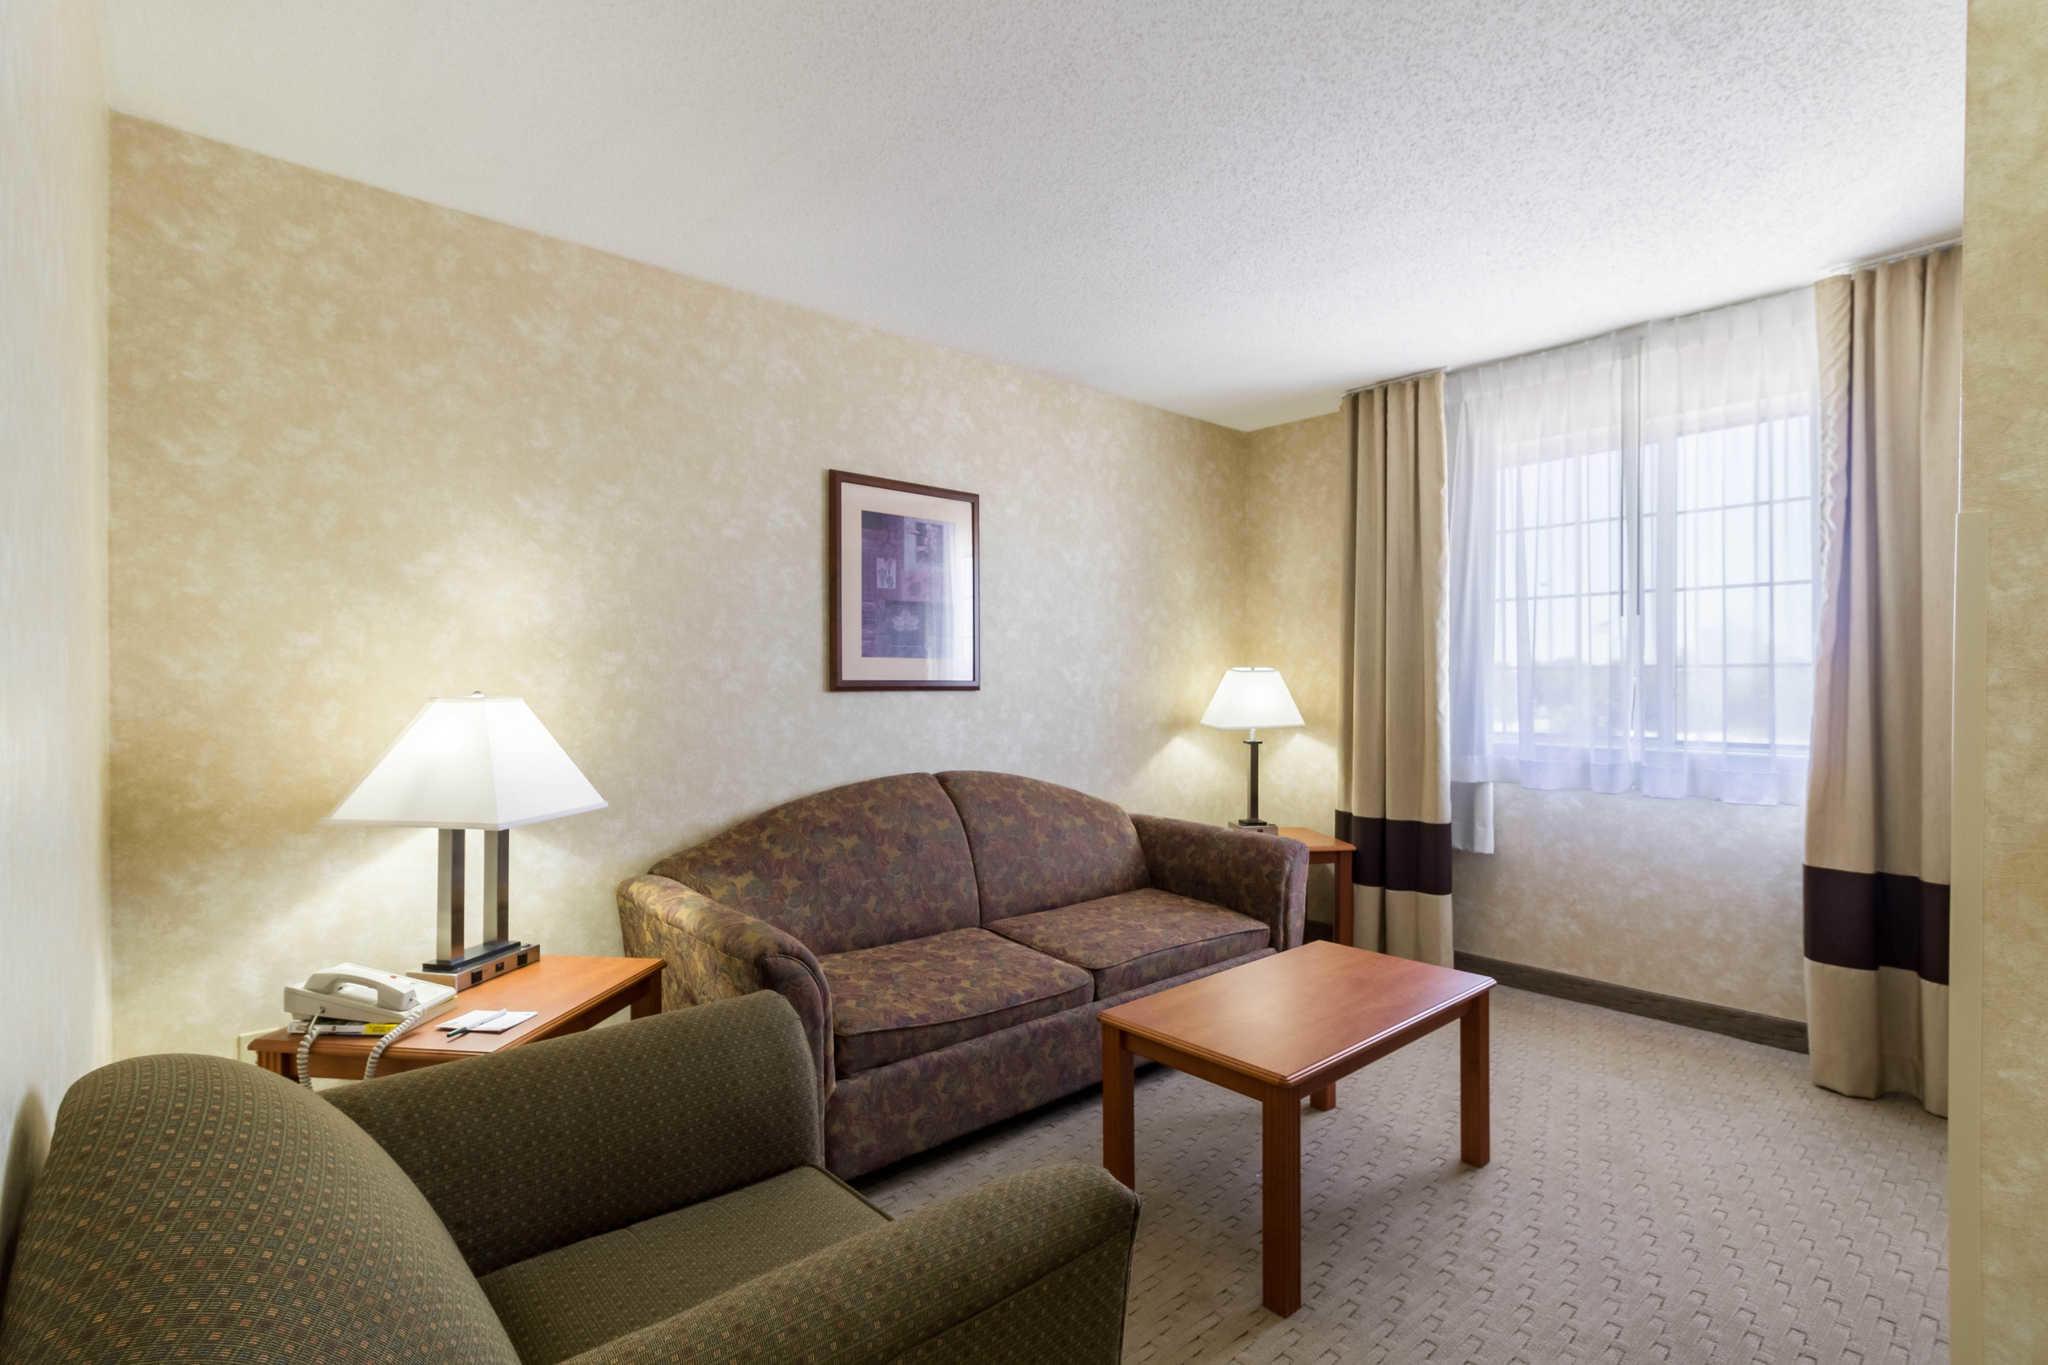 Marshall Mn Hotel Rooms